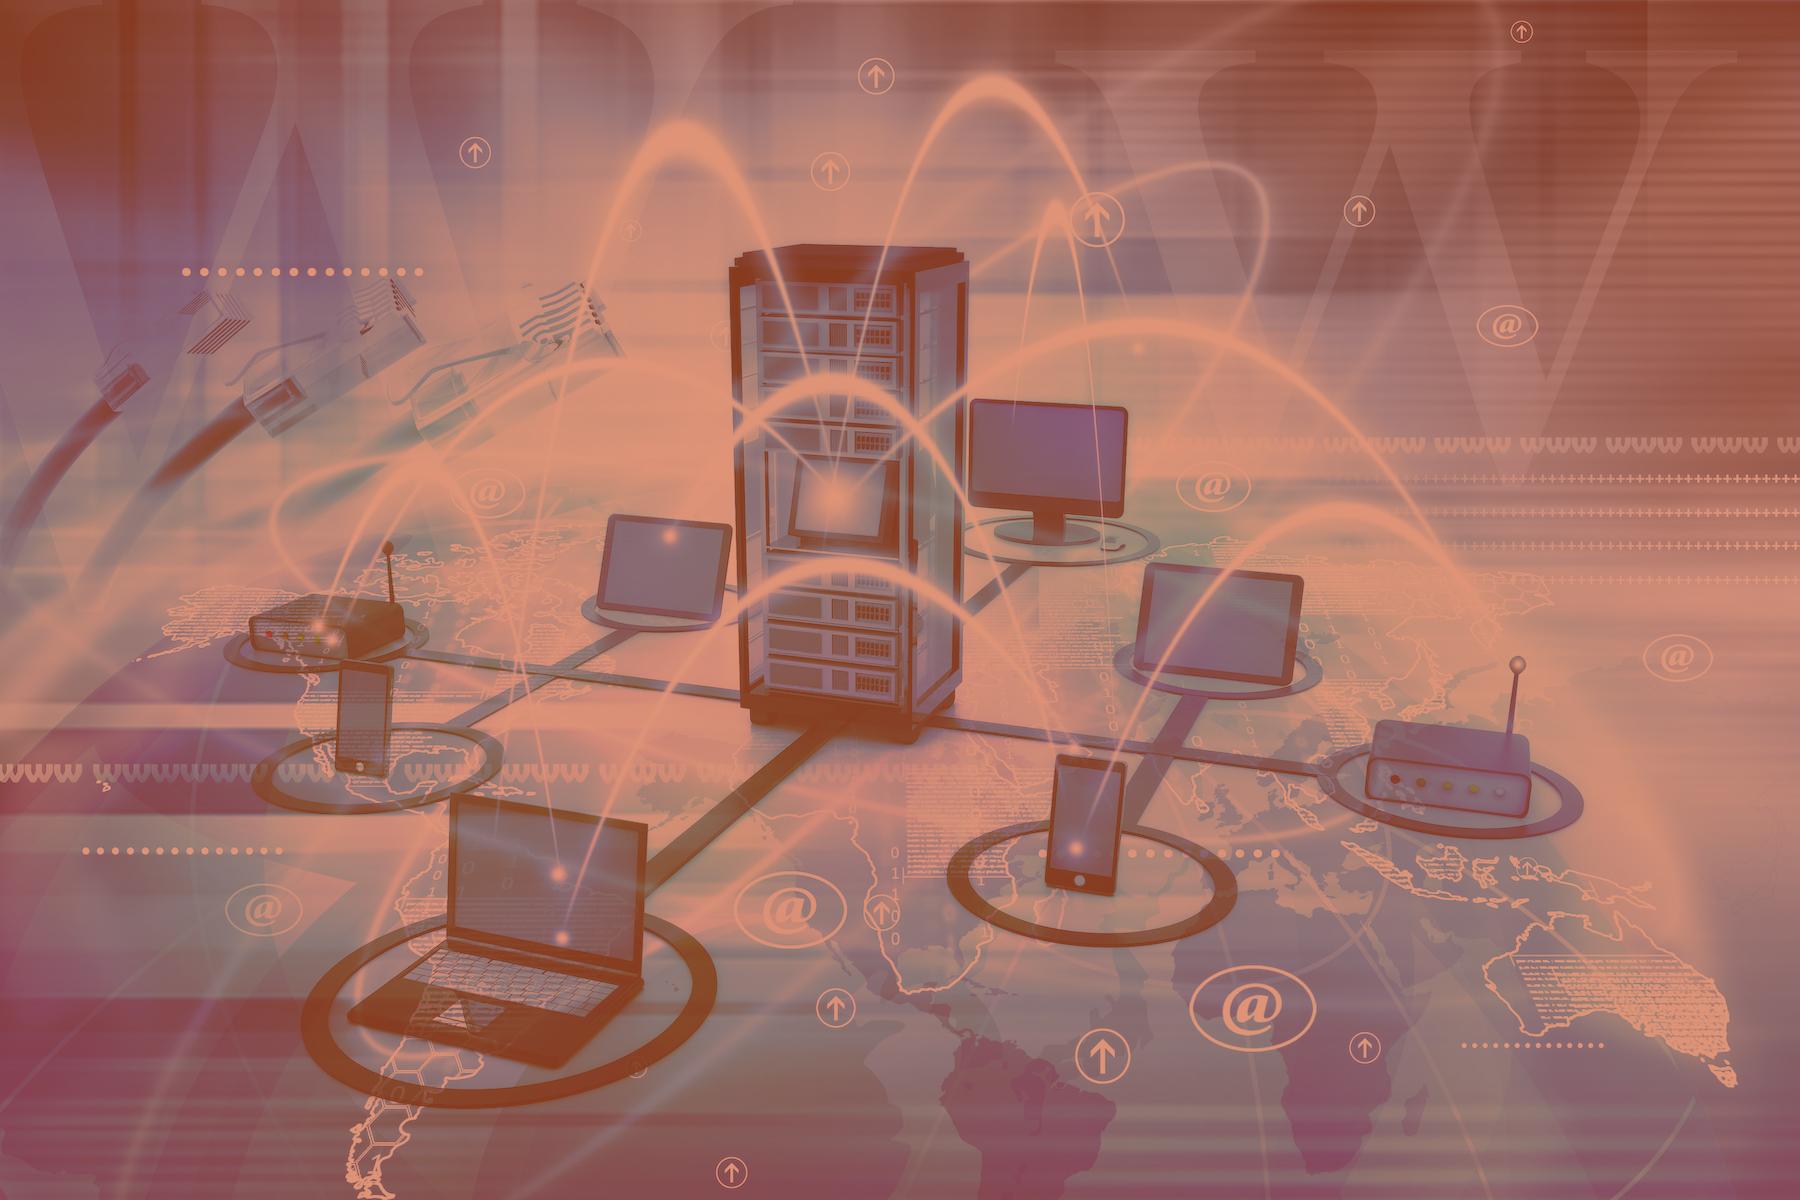 reseaux-informatiques-entreprises-installation-dsp-telecom-anglet-64